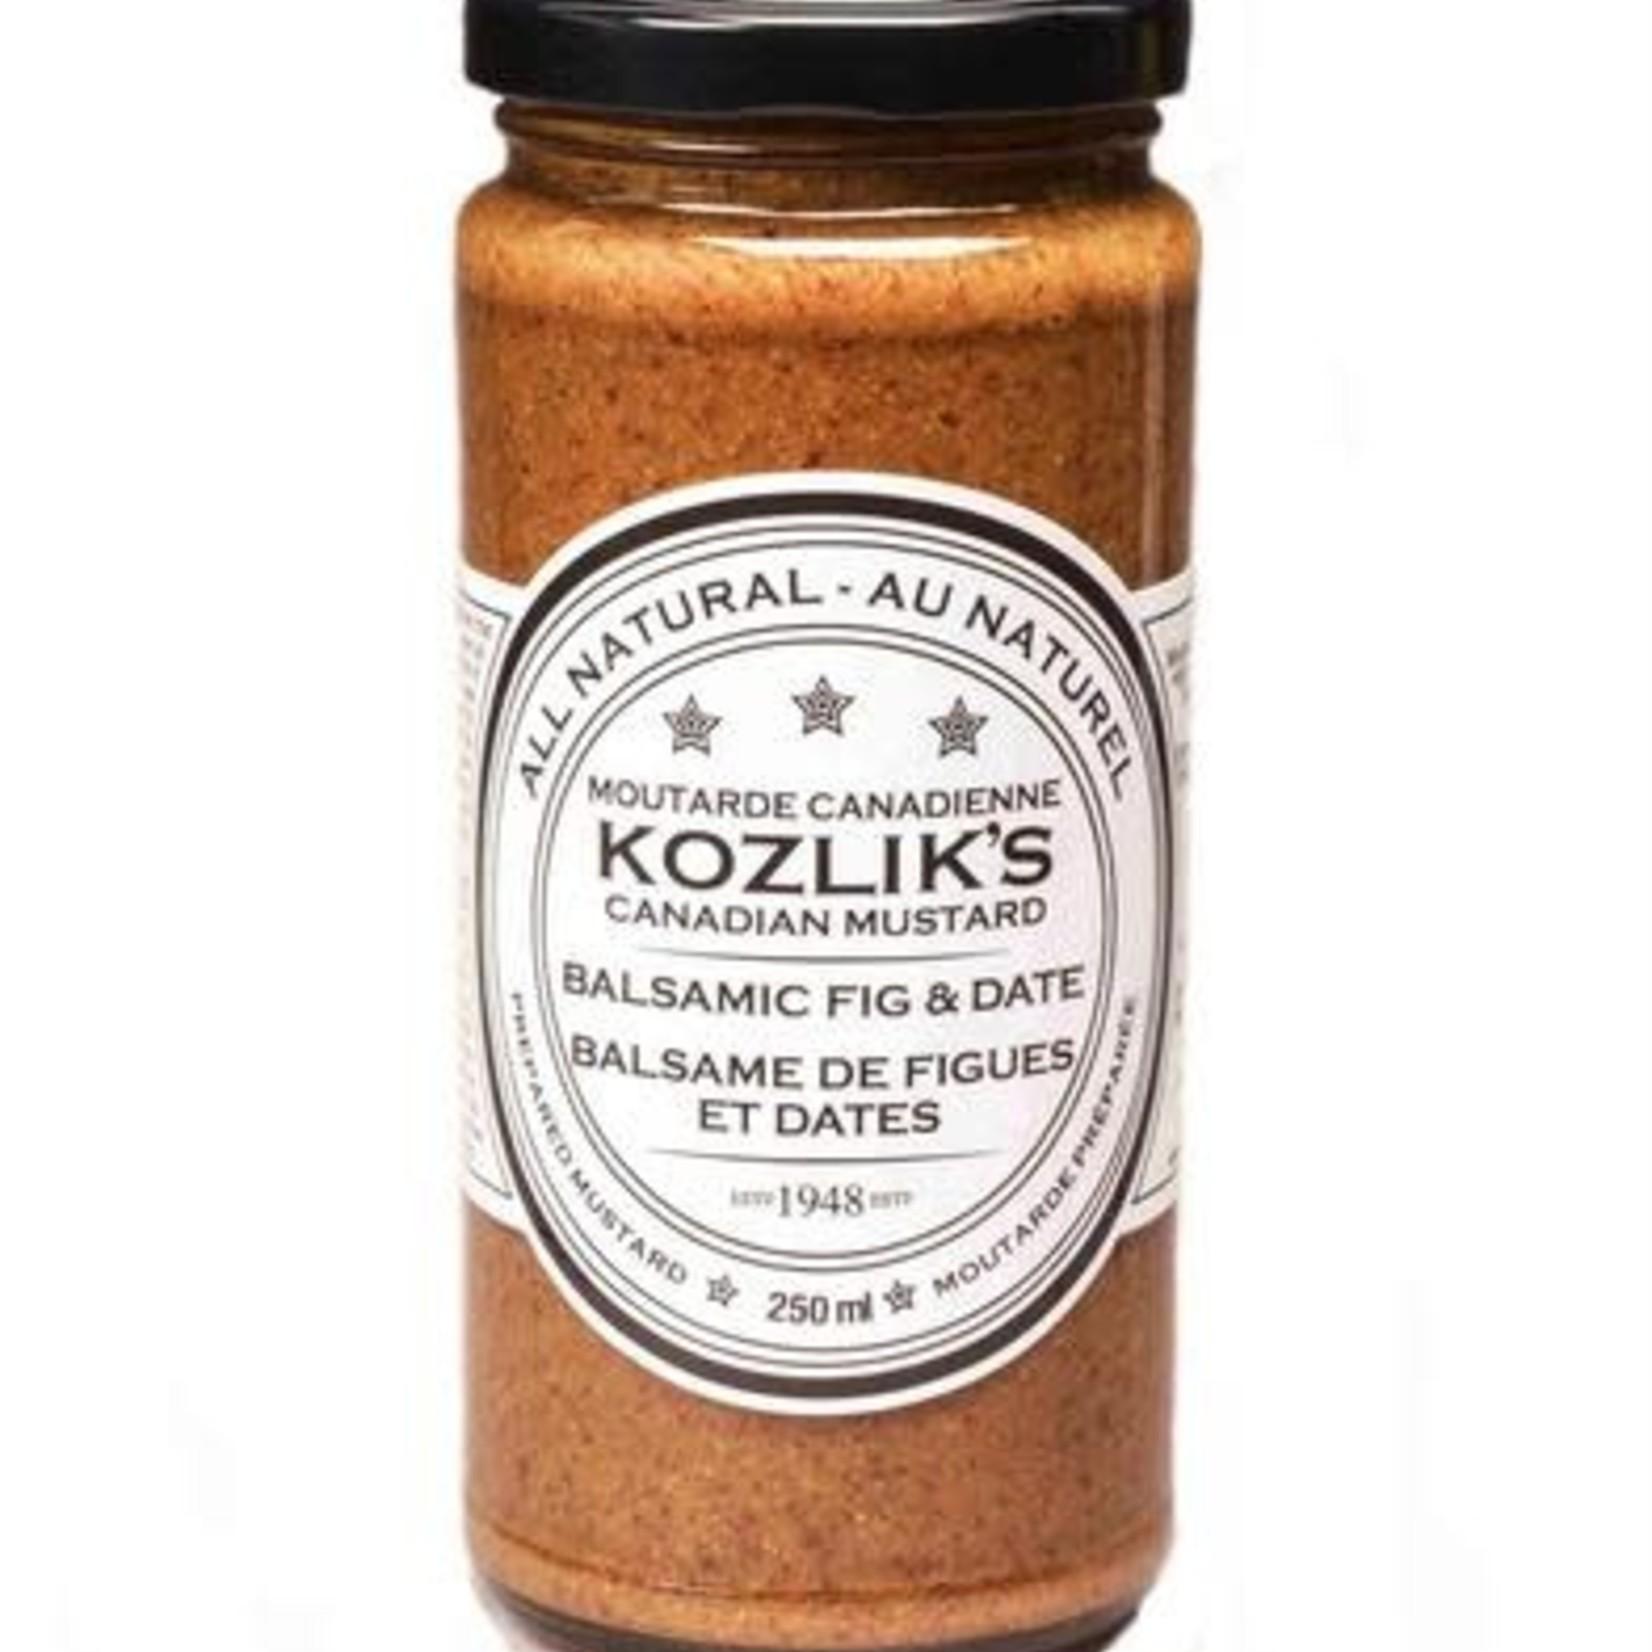 Kozlik's Kozlik's Balsamic Fig & Date Mustard 250ml